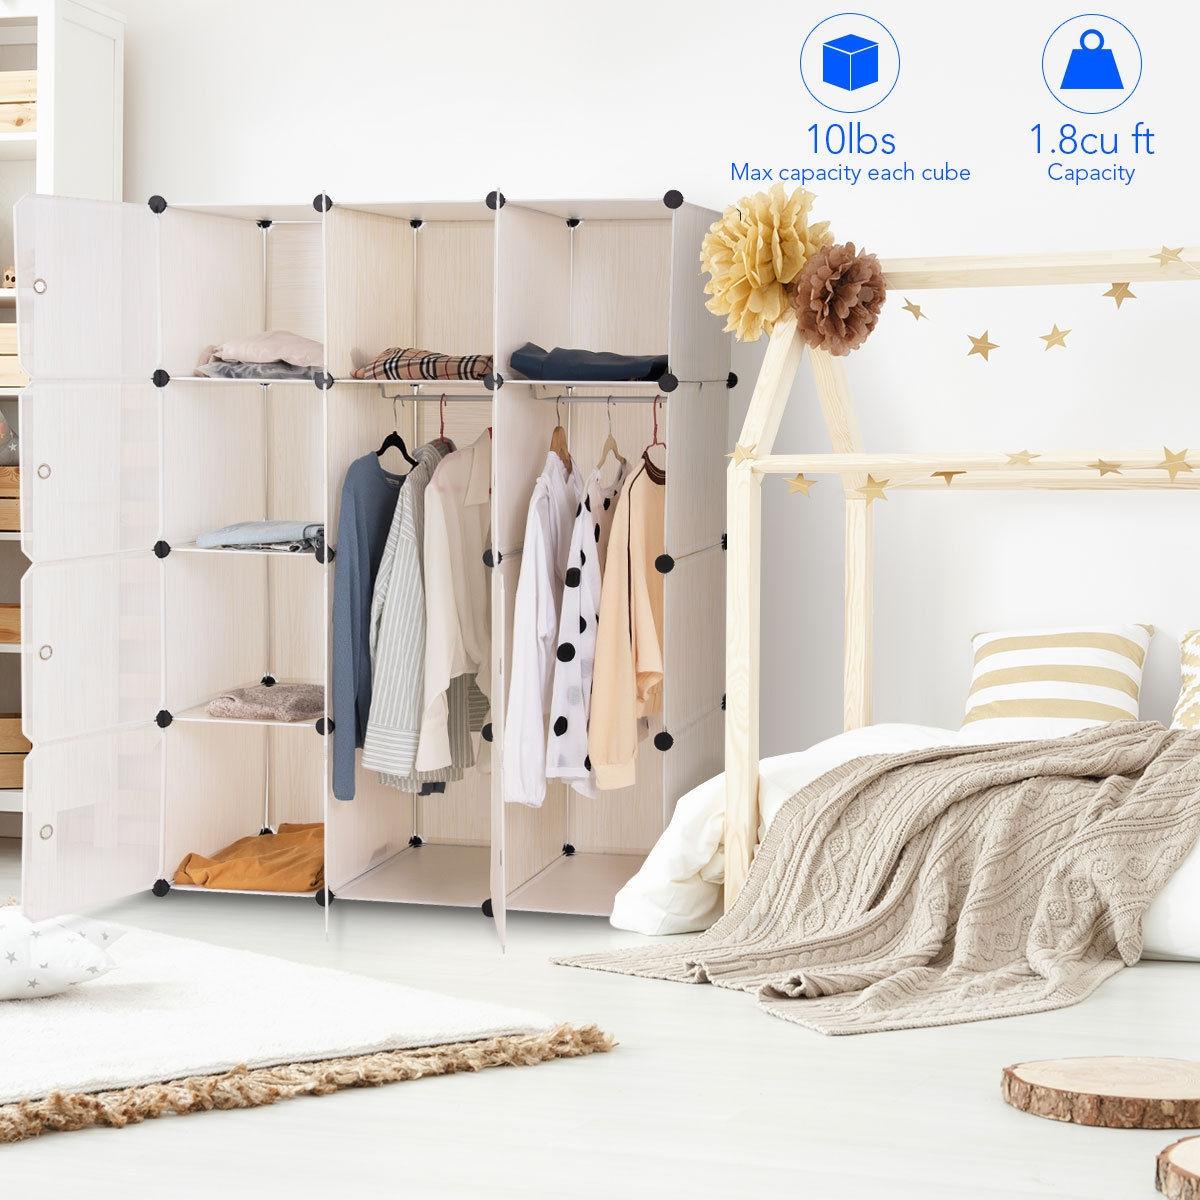 DIY Cube Portable Closet Wardrobe Storage Cabinet with Doors